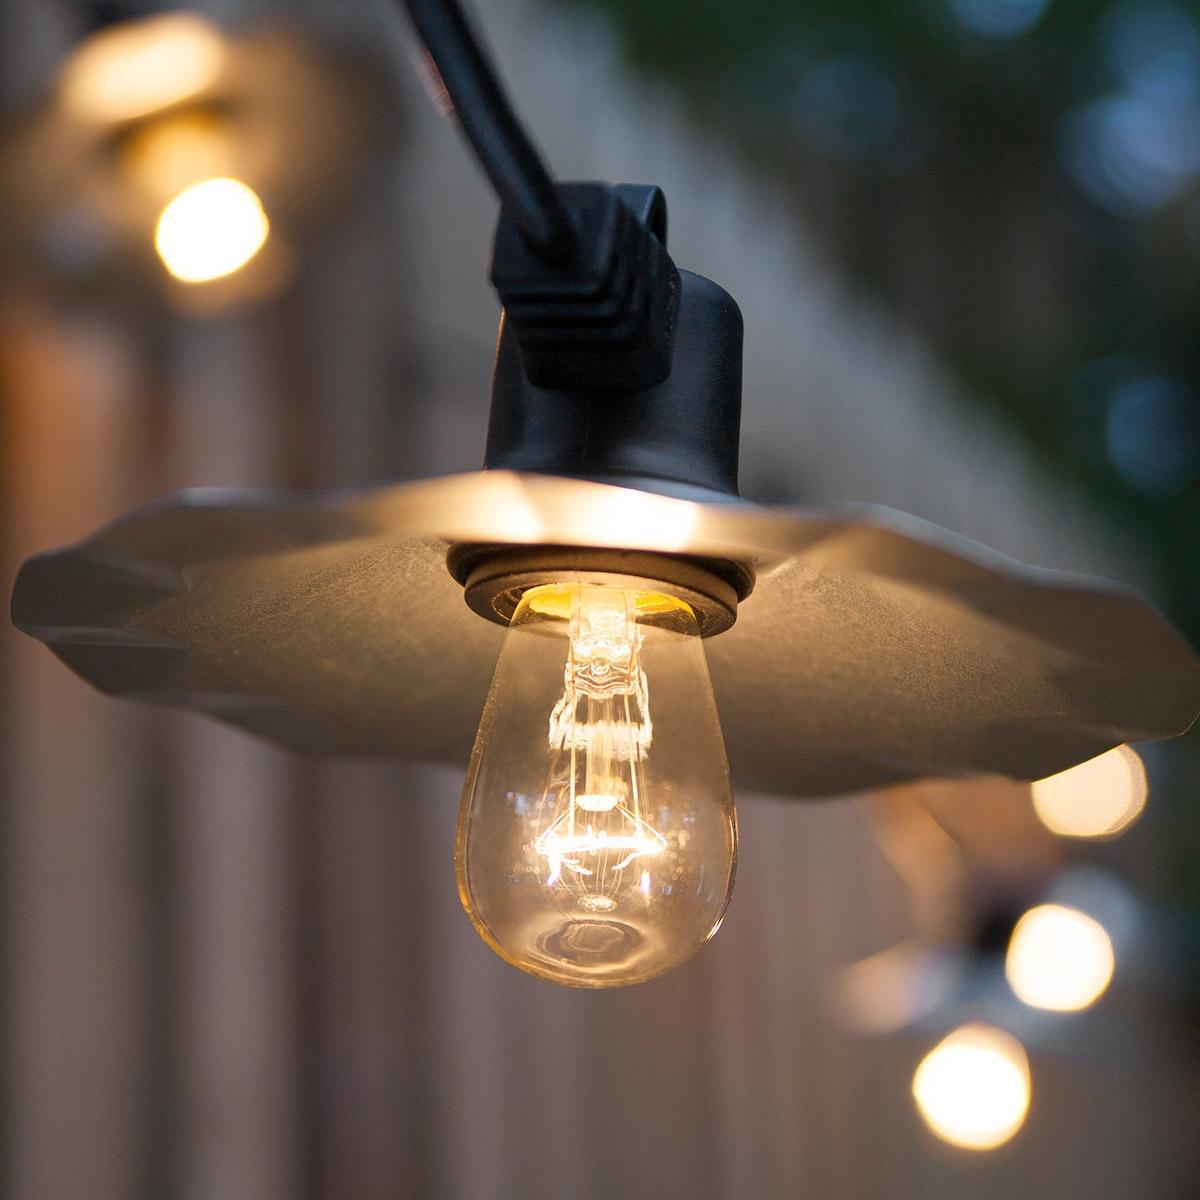 Cafe String Lights Clear S14 Bulbs Silver Shades Yard Envy